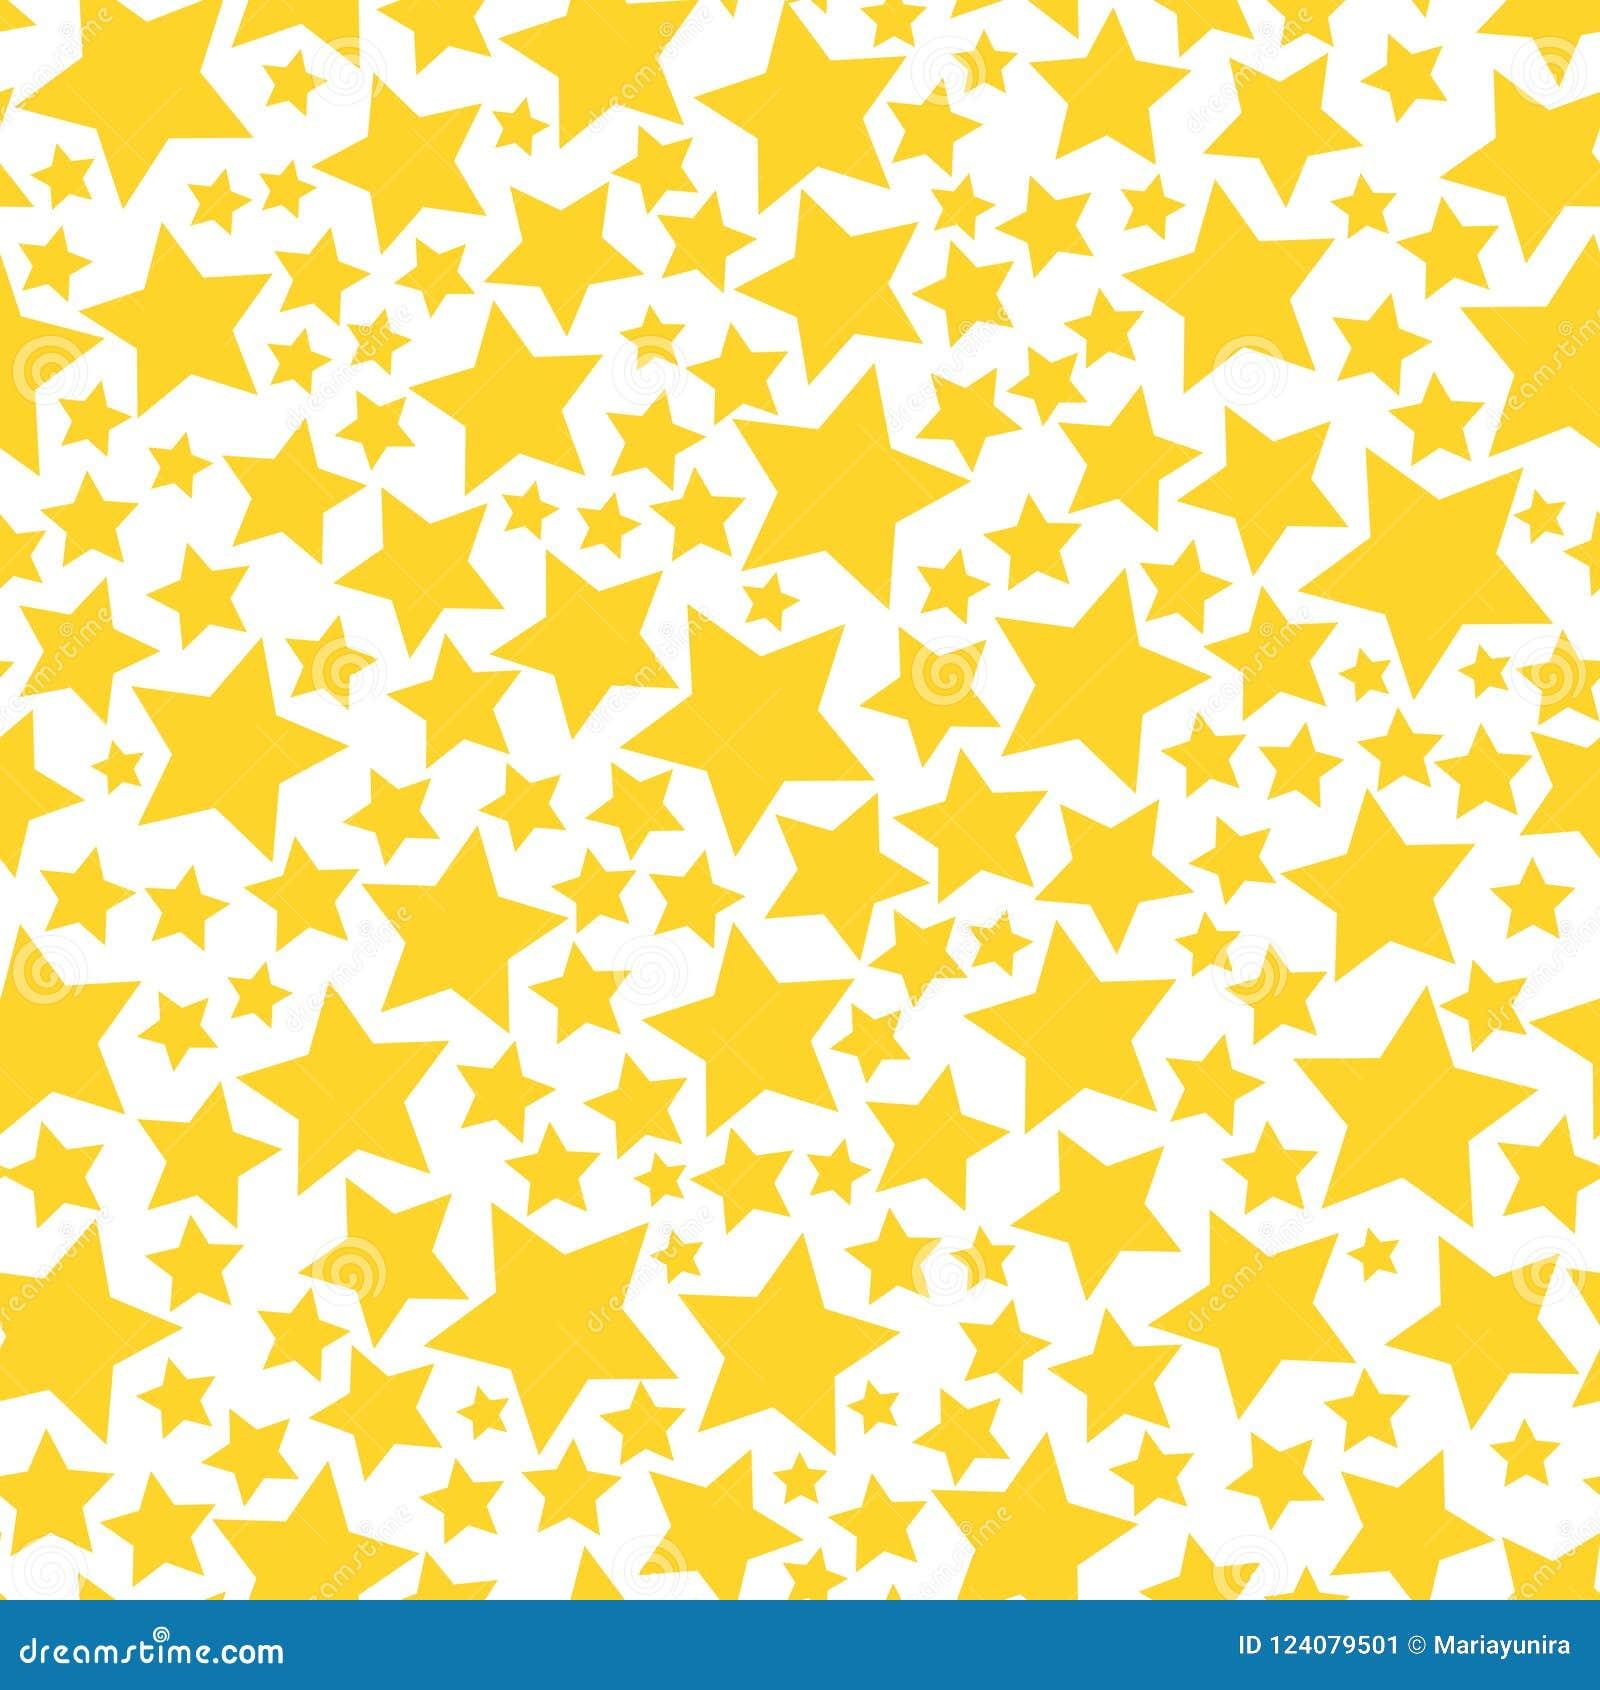 dfe972a17 Papel De Parede Arabesco Amarelo Claro Fundo Branco   Flowers HD ...